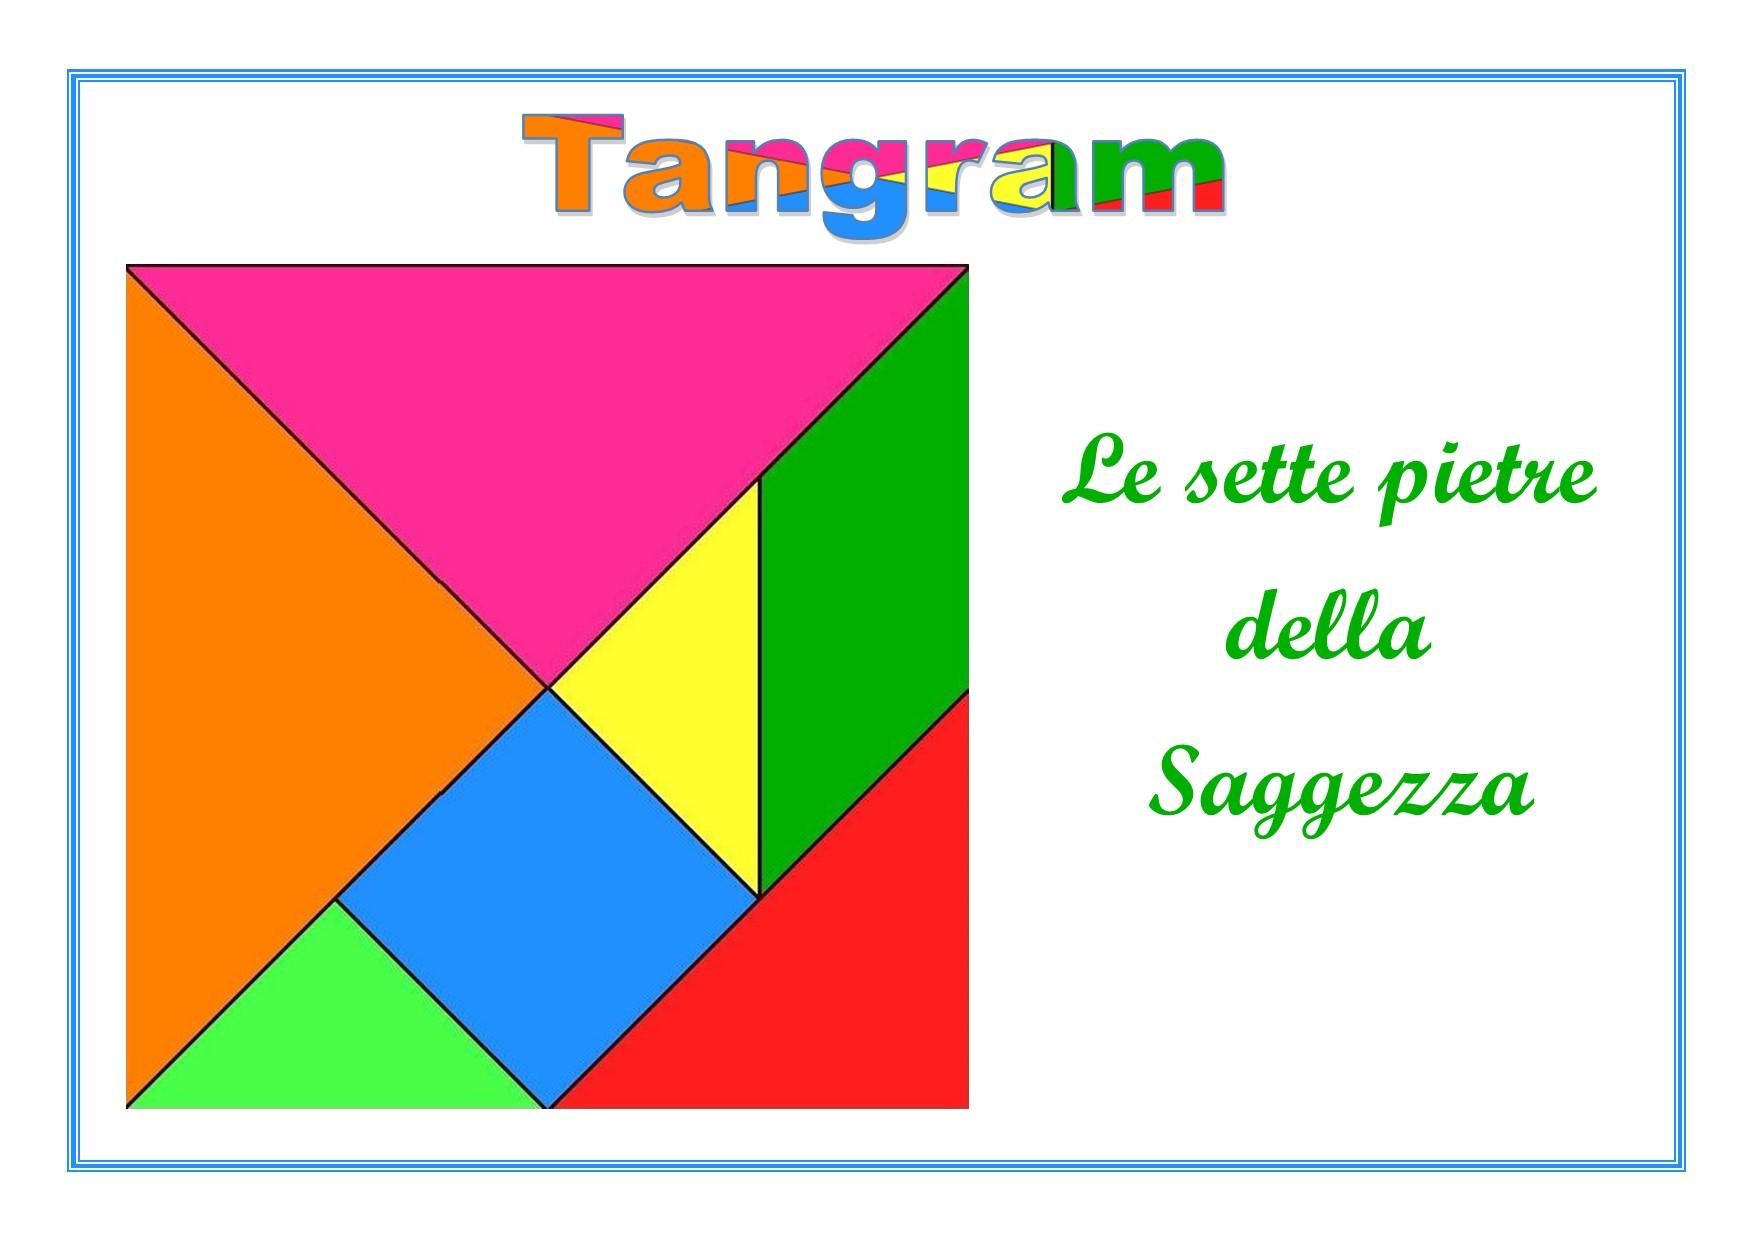 La magia del Tangram